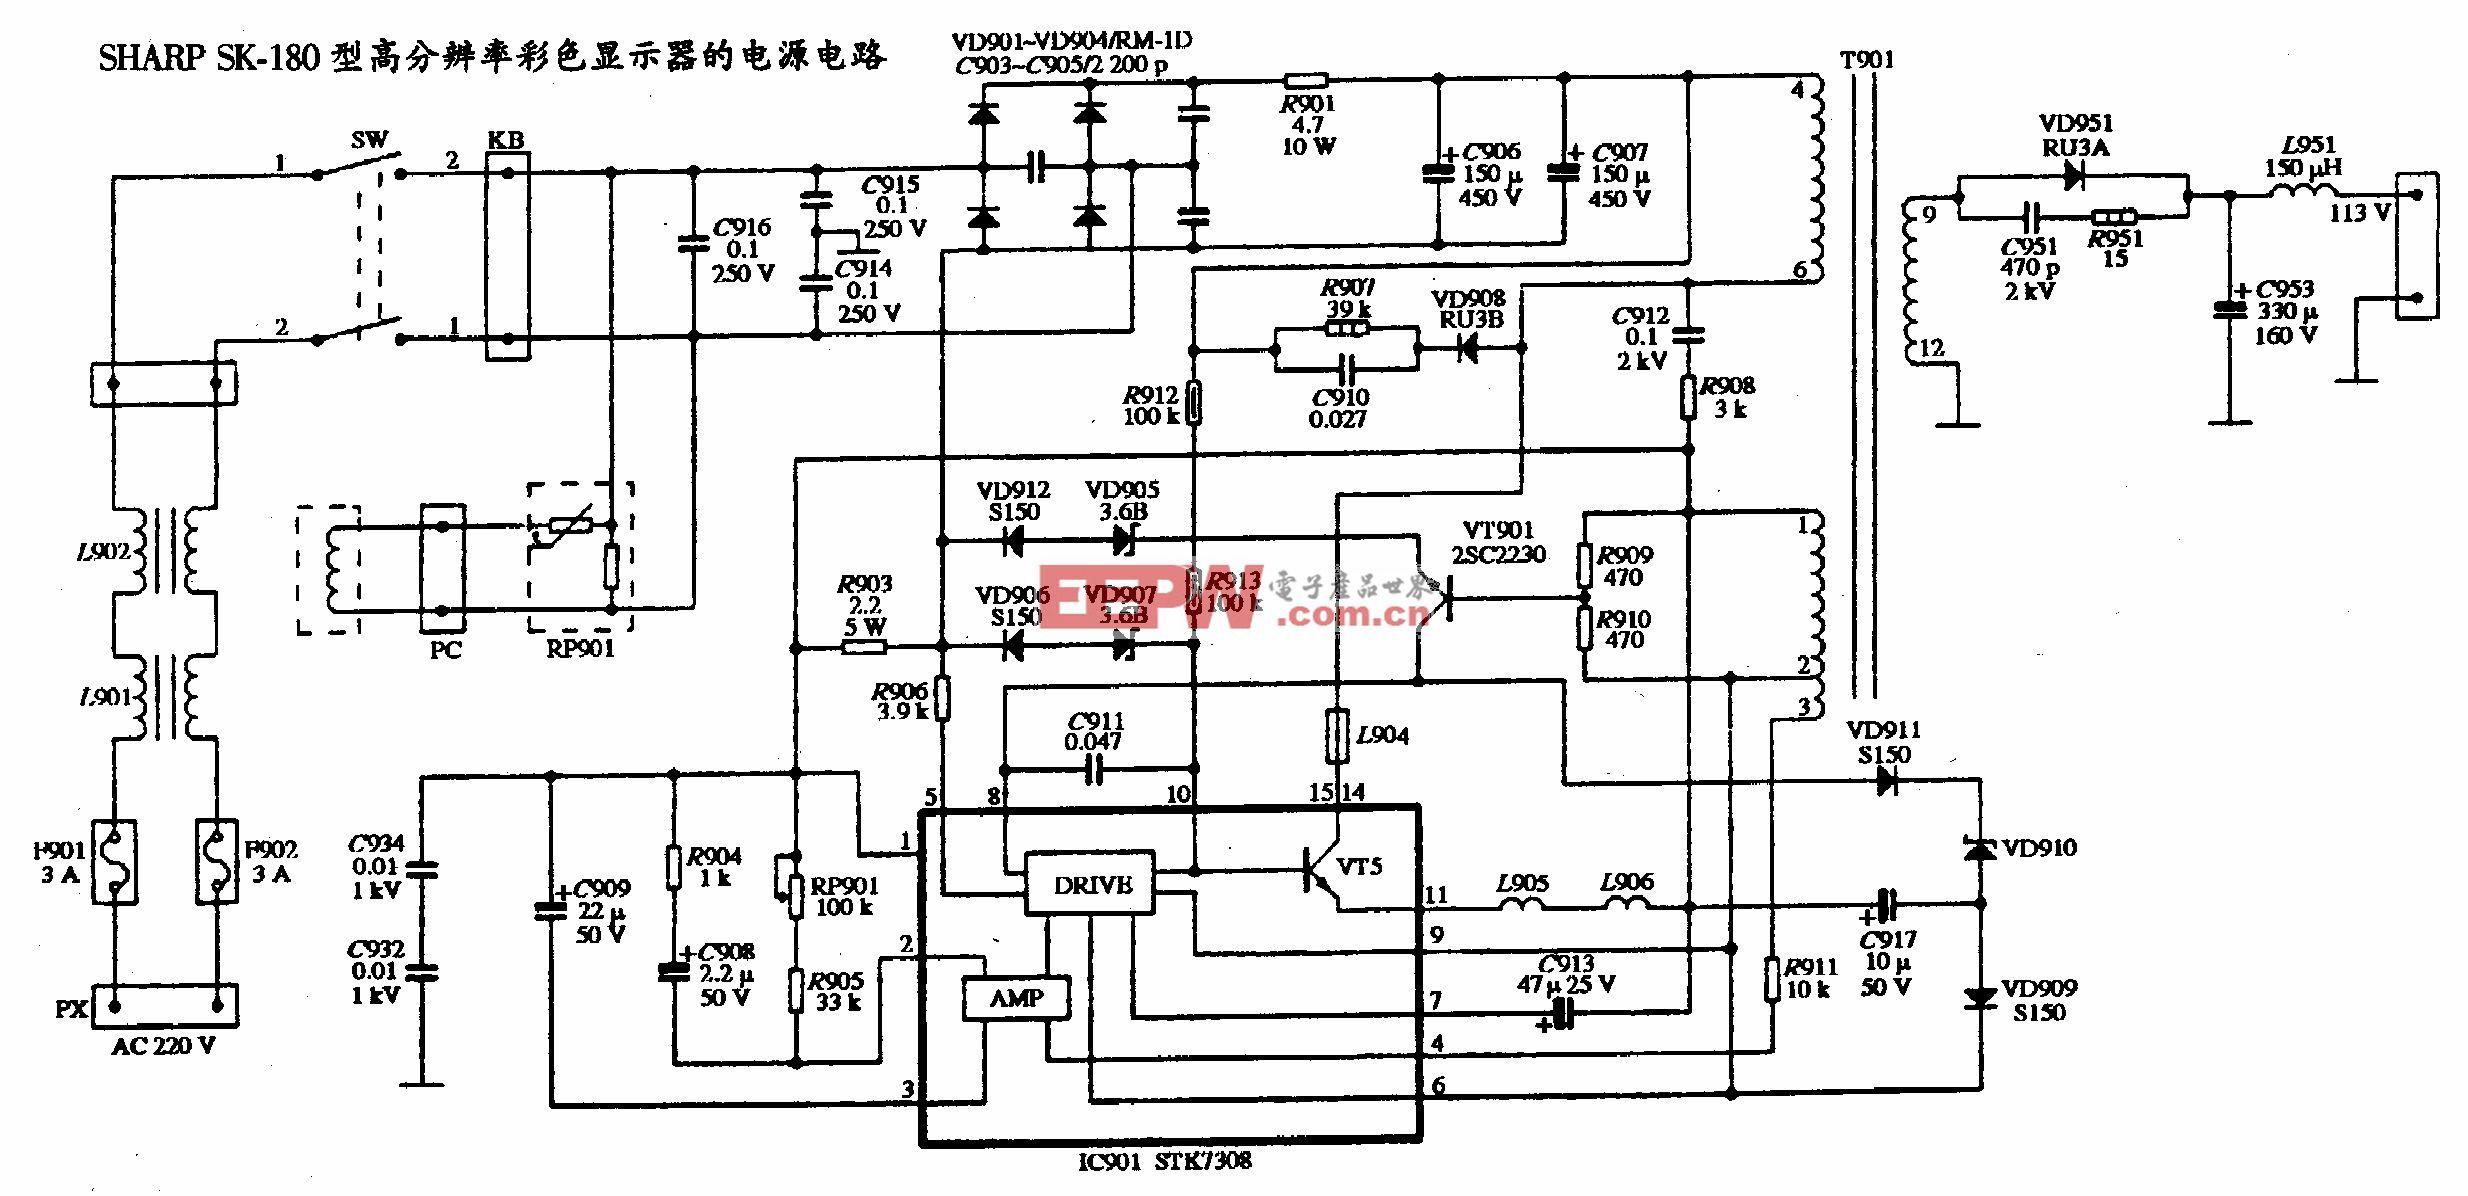 SHARP SK-180型高分辨率彩色显示器的电源电路图